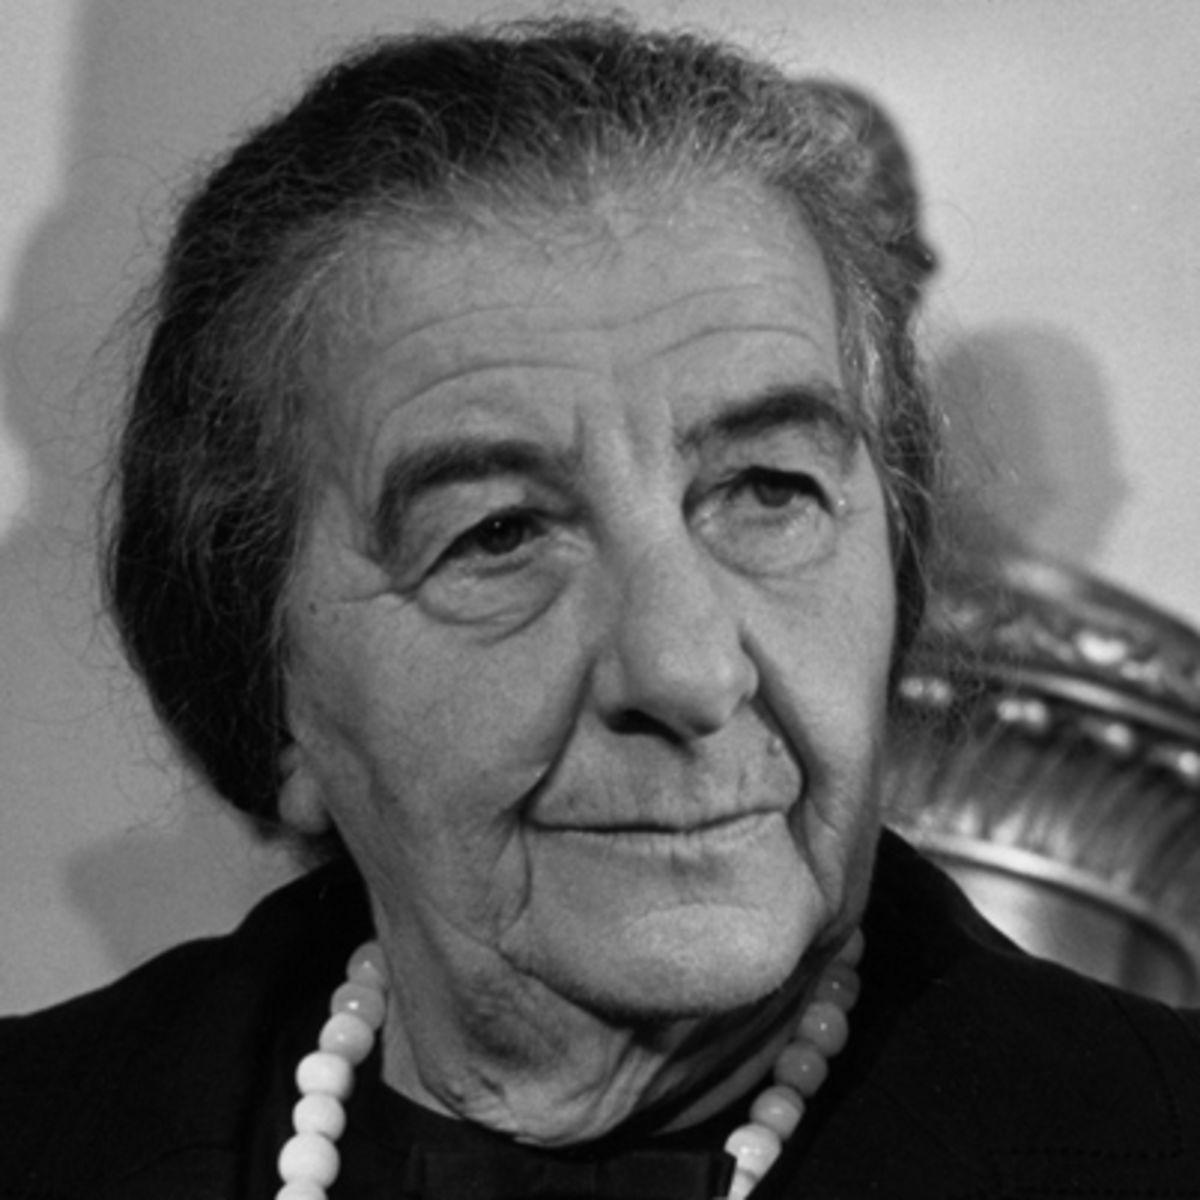 Golda Meir: Image Credit - www.biography.com